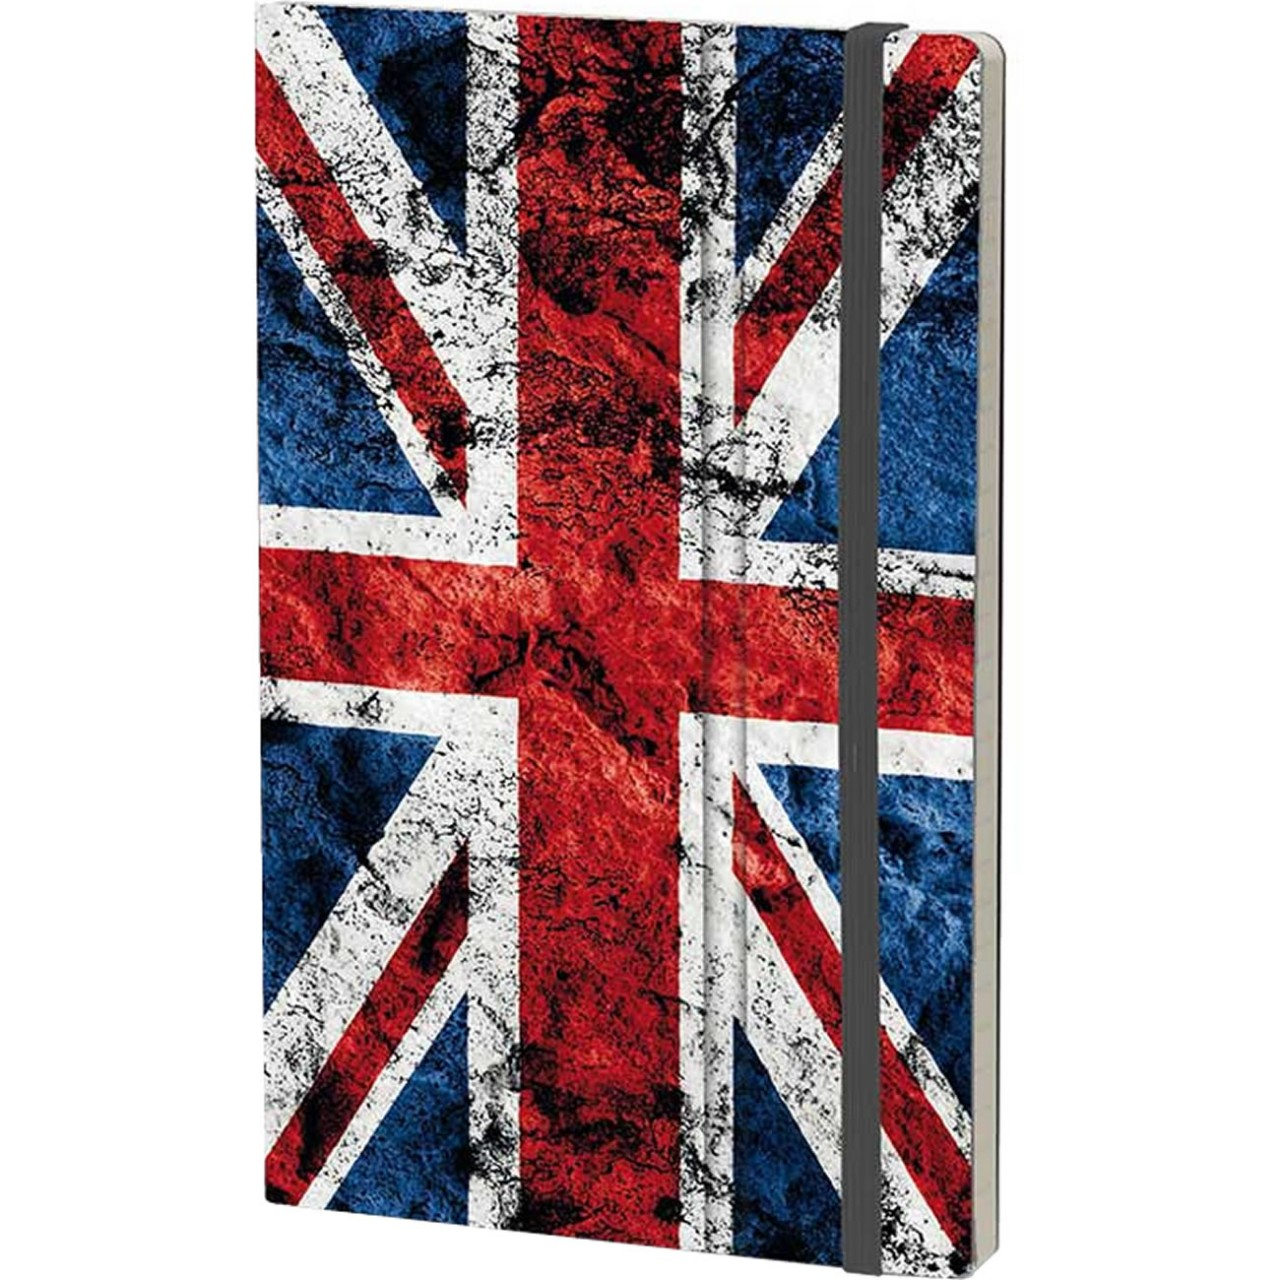 Stifflex Notizbuch HISTORICAL NOTES 9 x 14 cm 144 S., GOD SAVE THE QUEEN (UK Flag)